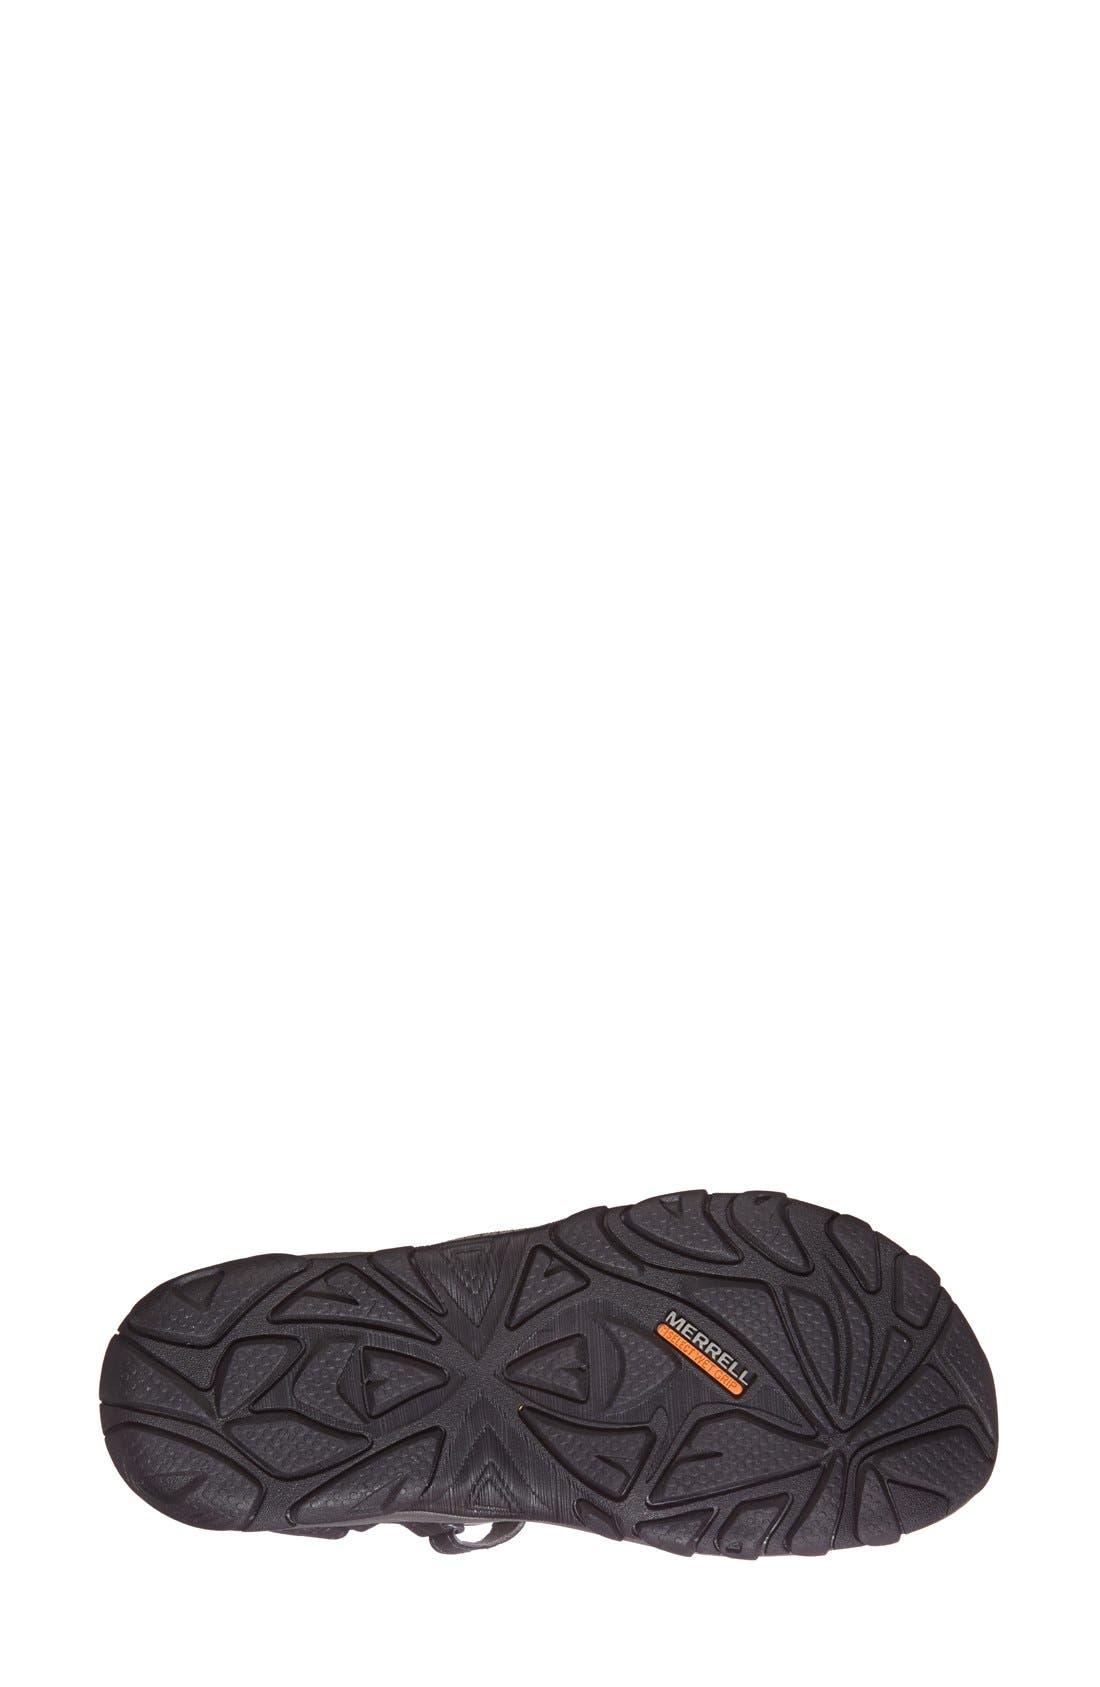 'Enoki' Water-Resistant Sandal,                             Alternate thumbnail 3, color,                             001